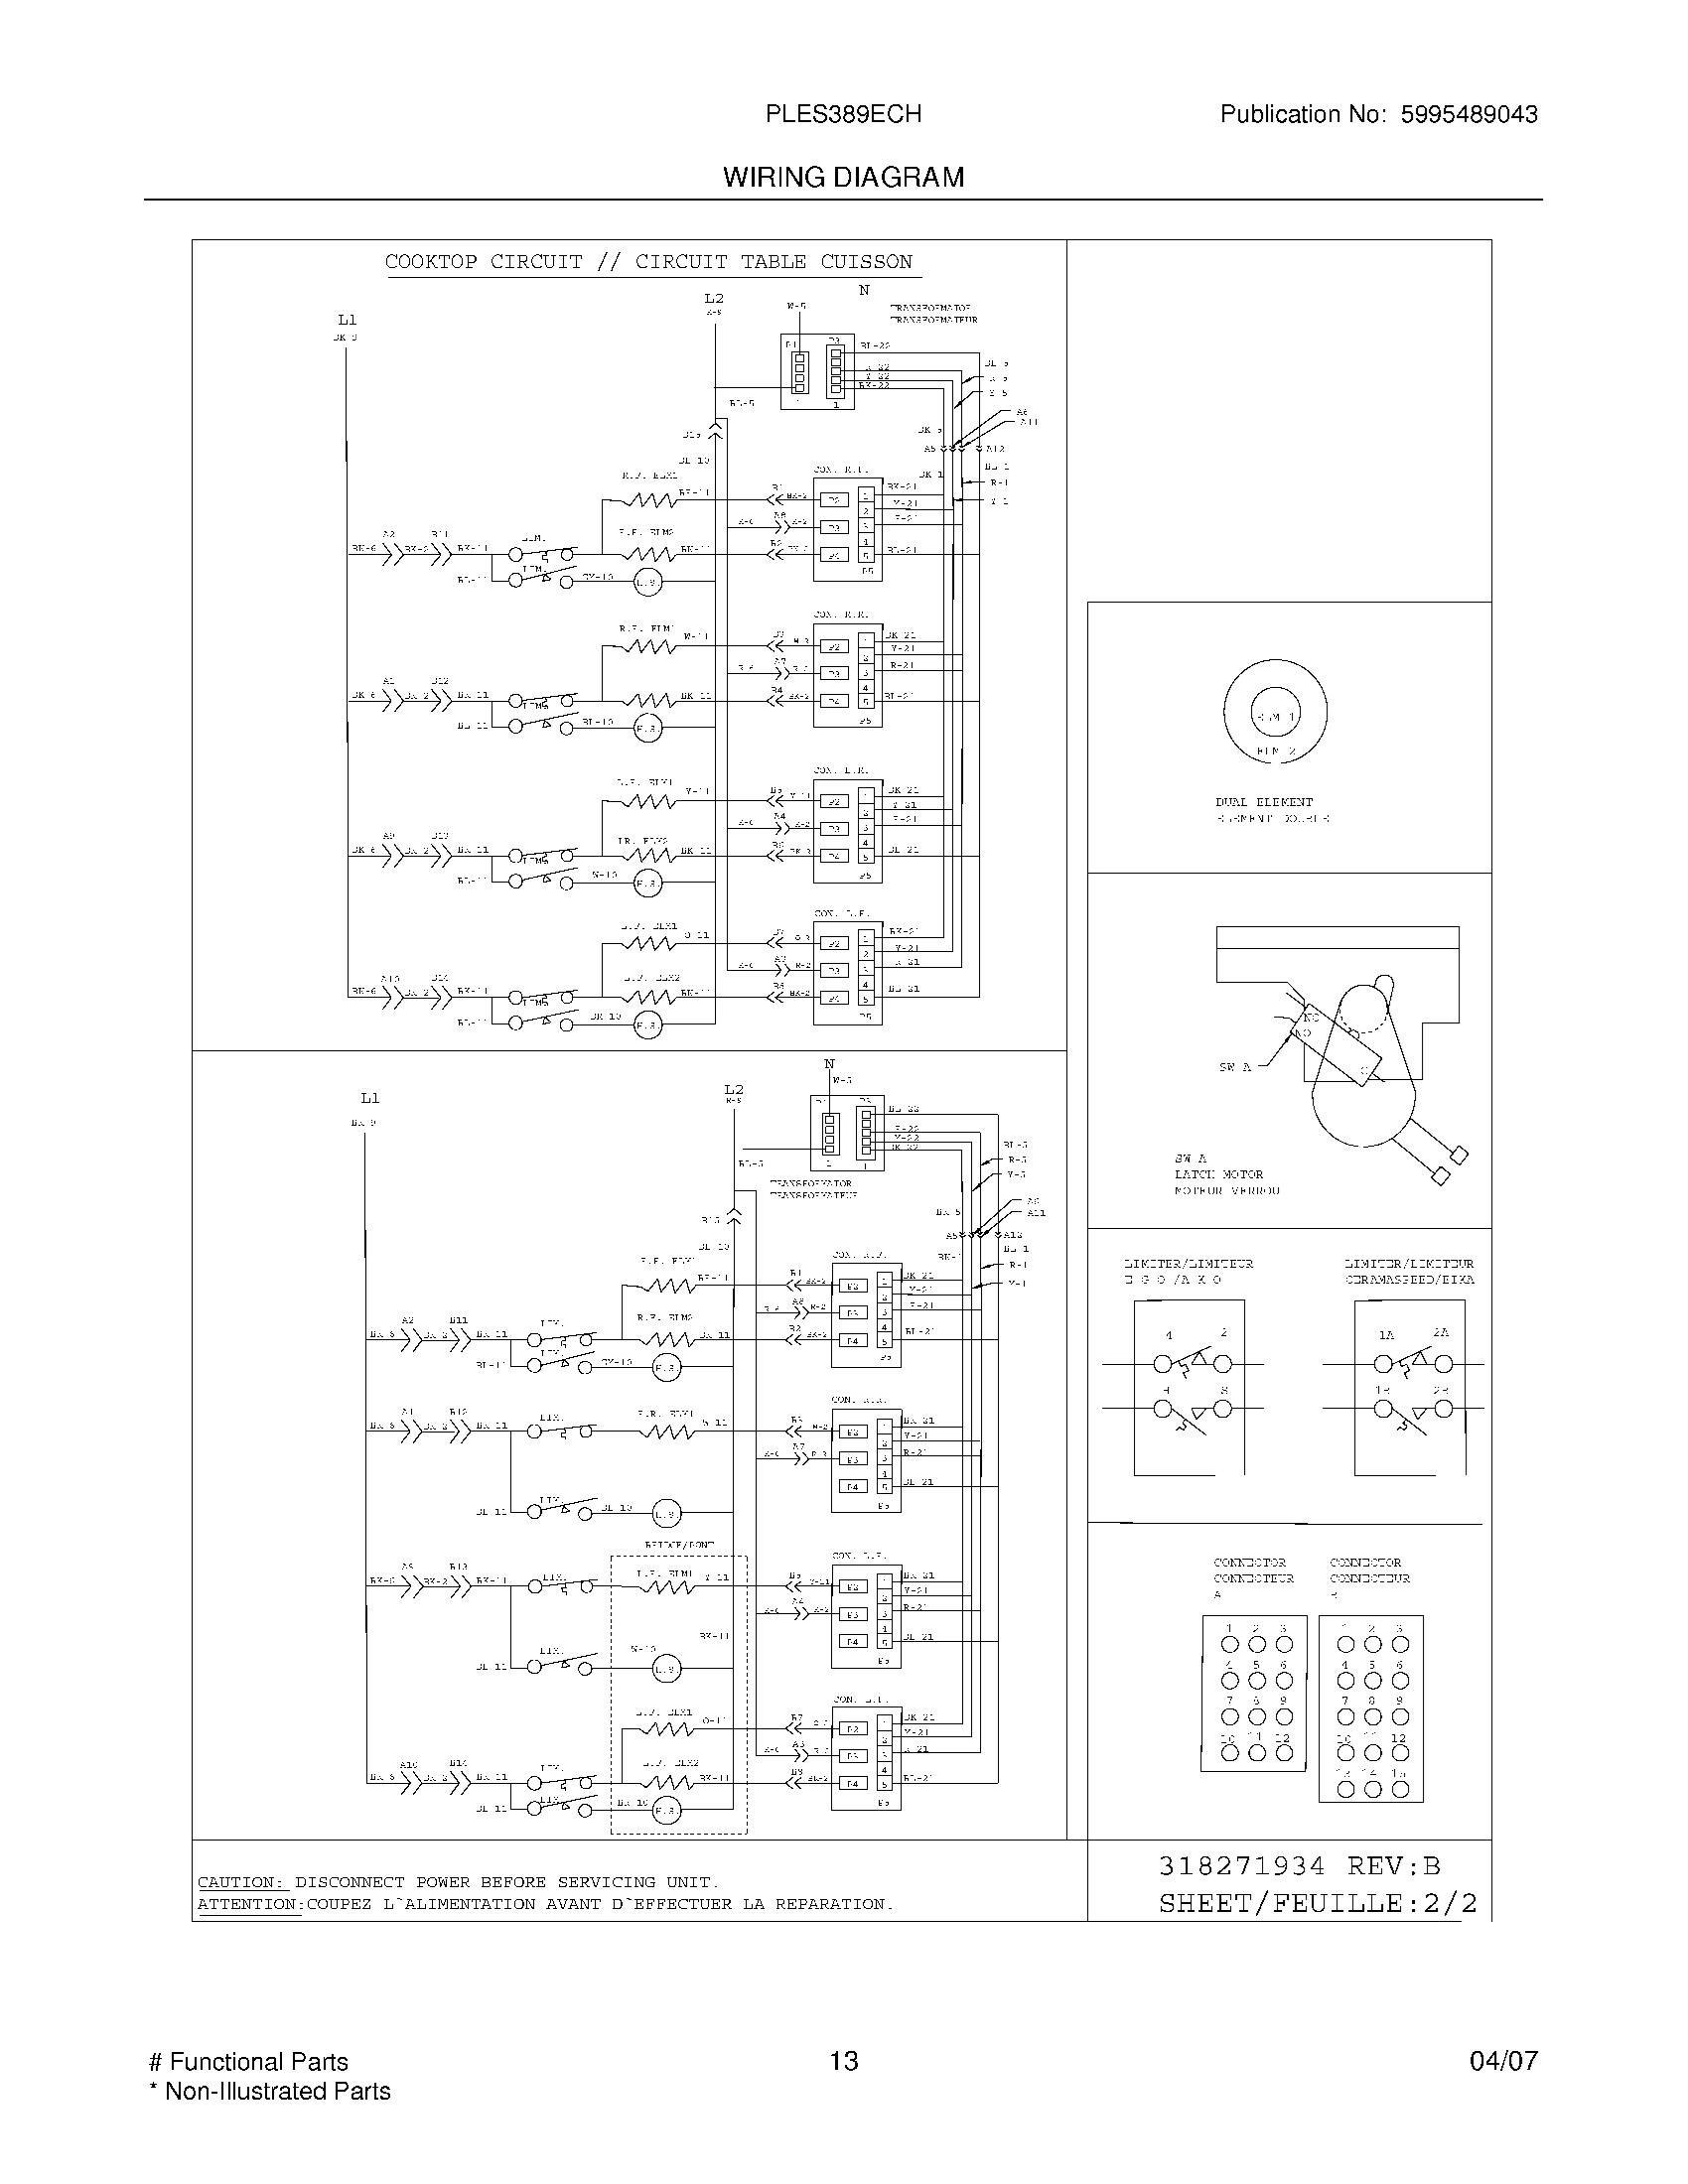 Terrific Ke70 Alternator Wiring Diagram Somurich Com Wiring Digital Resources Attrlexorcompassionincorg